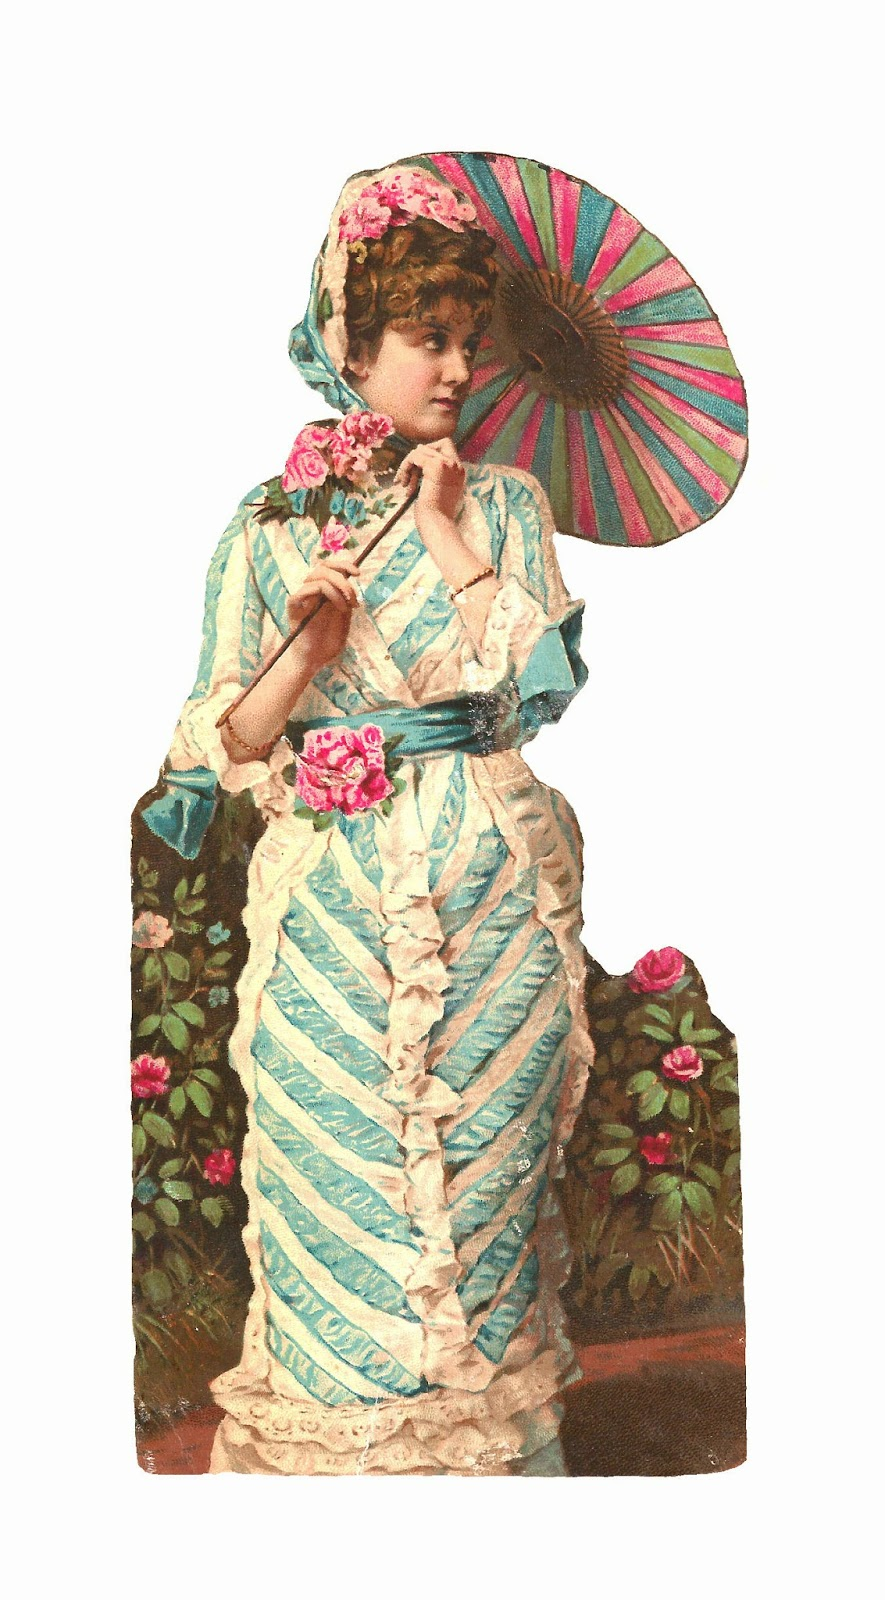 http://4.bp.blogspot.com/-zvbAlizkiTk/U4SkzrzfG9I/AAAAAAAAUA0/NYRFIf9Gdxg/s1600/woman_bl_dress_parasol_scrap.jpg